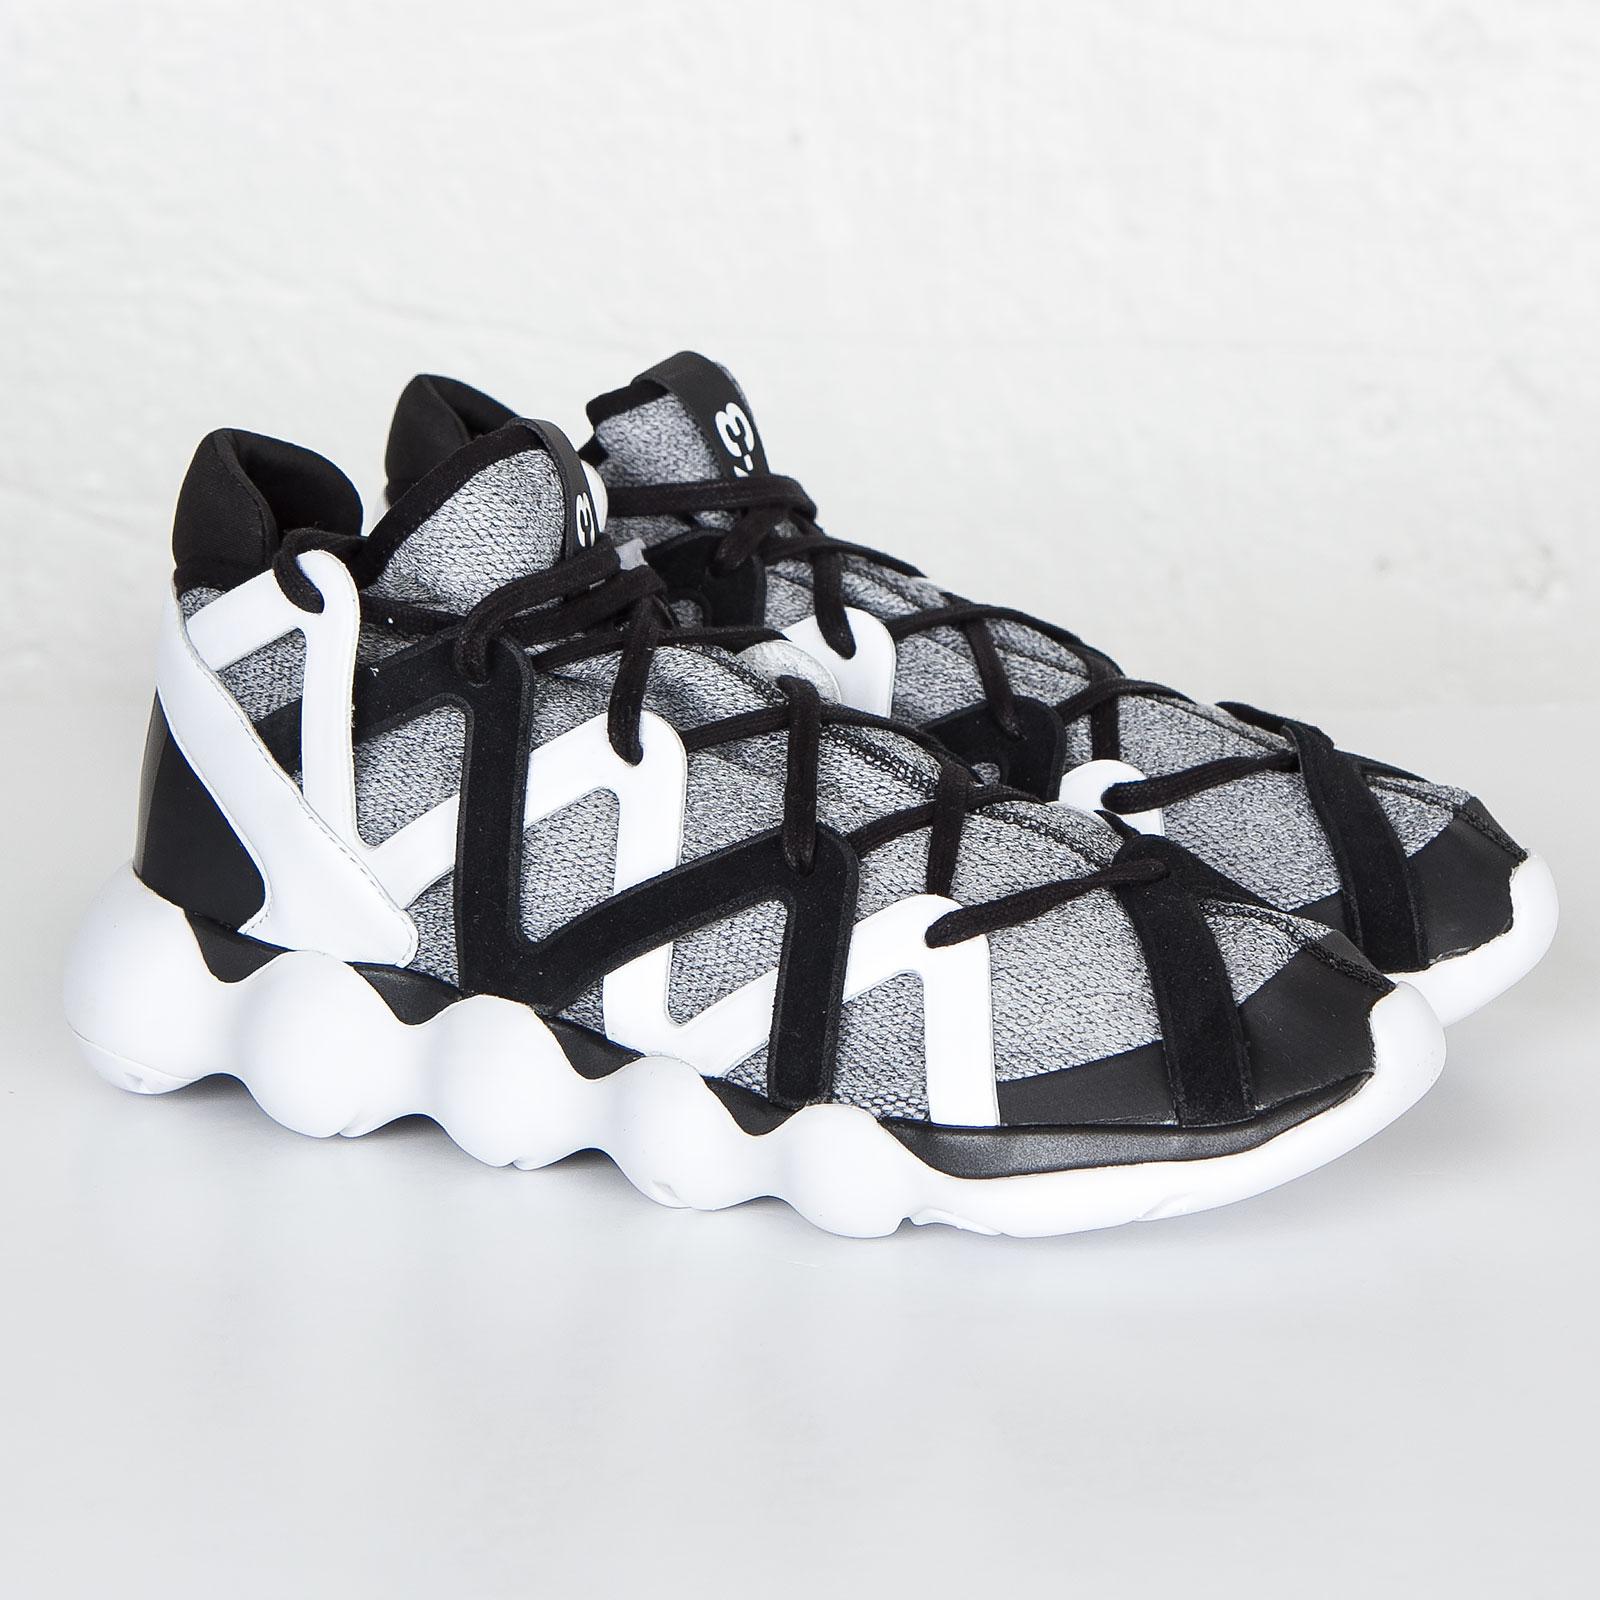 a980144f4a18 adidas Kyujo High - Aq5544 - Sneakersnstuff